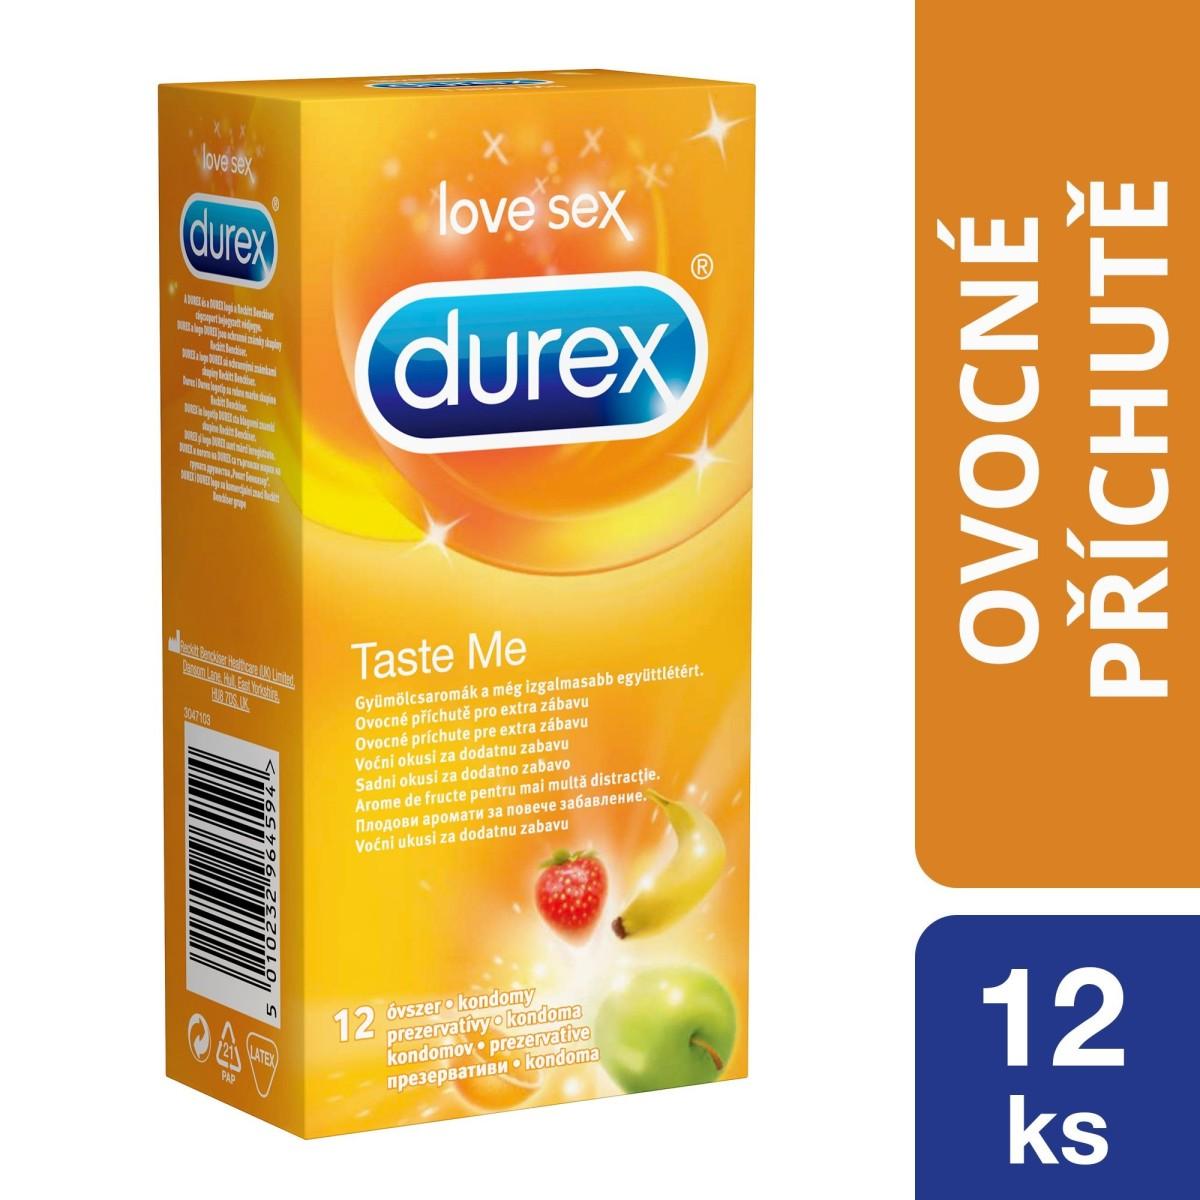 Durex Taste Me Condoms 12 Pack